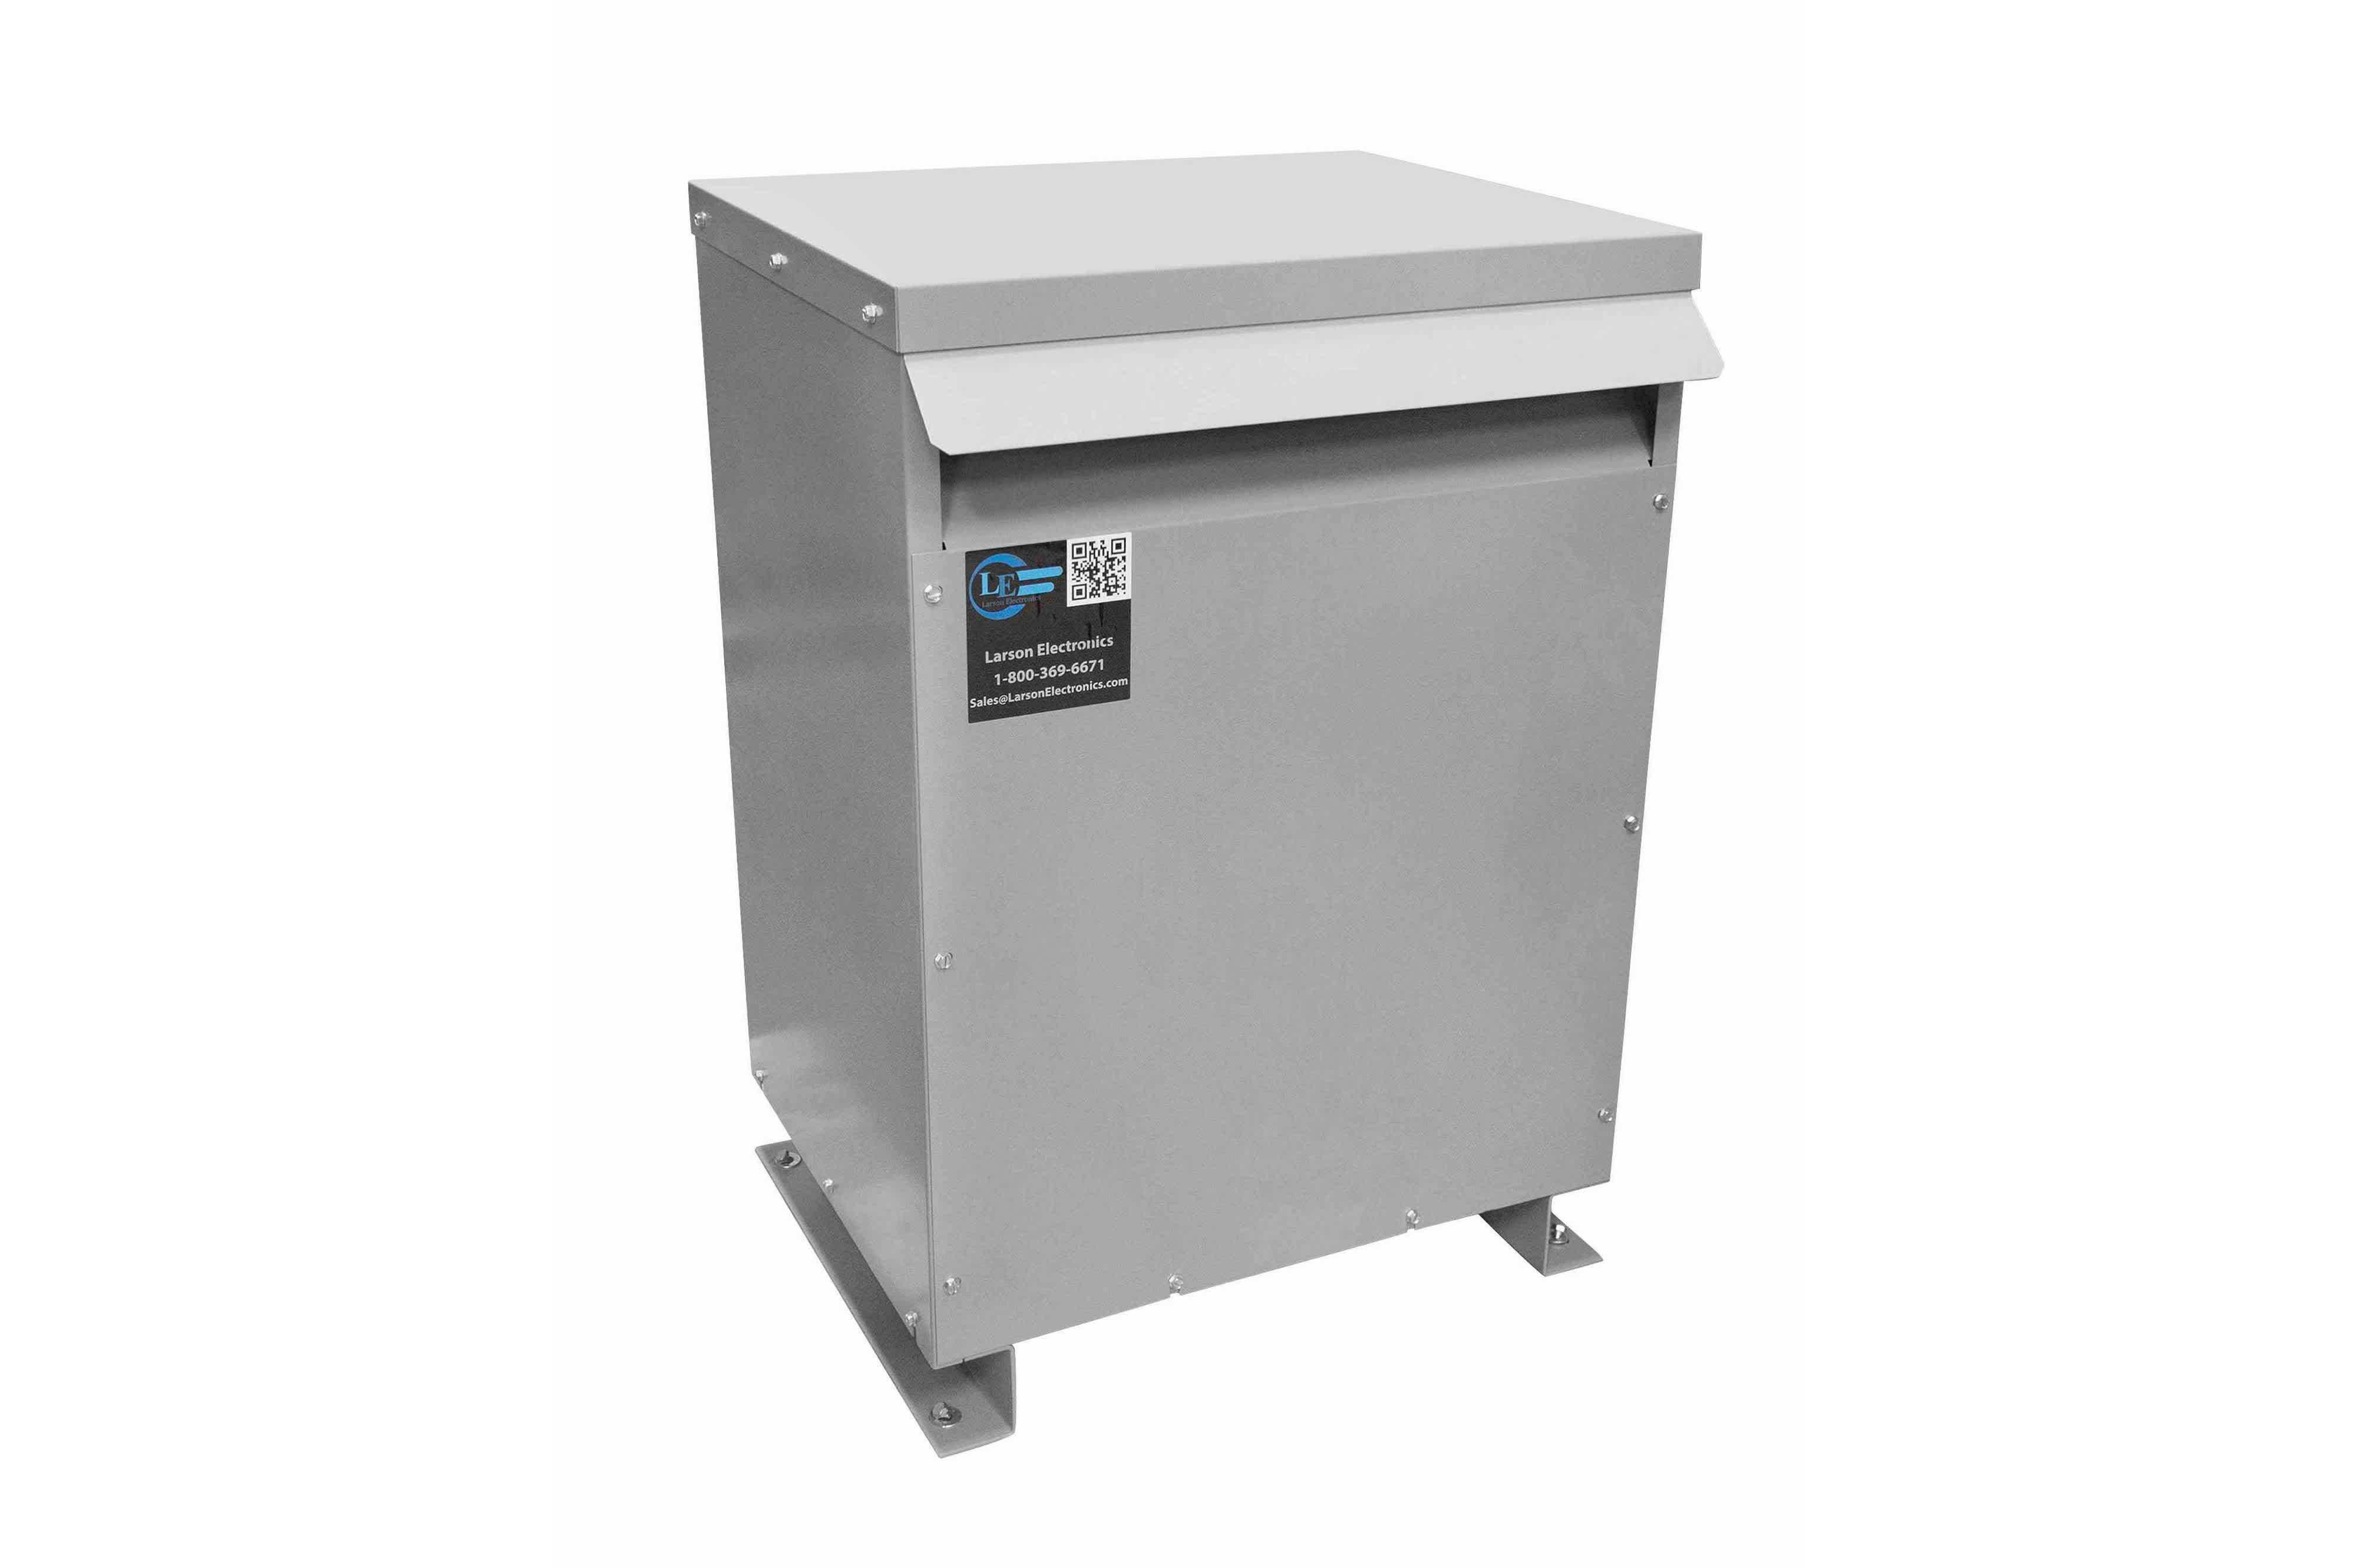 300 kVA 3PH DOE Transformer, 575V Delta Primary, 415Y/240 Wye-N Secondary, N3R, Ventilated, 60 Hz